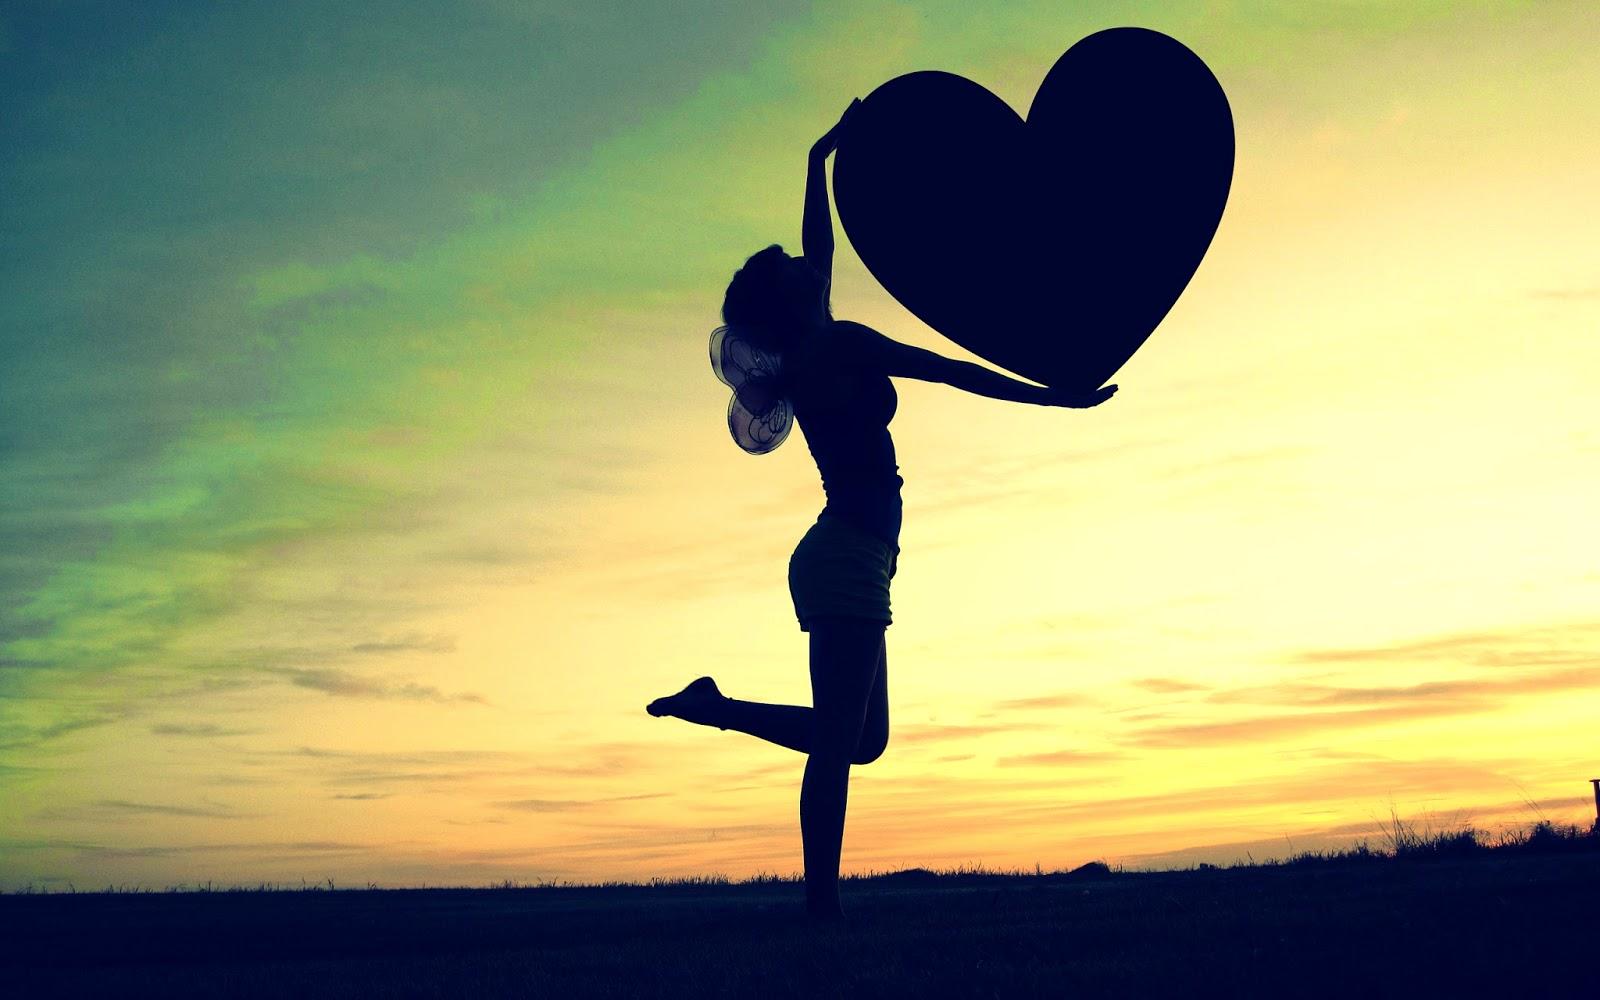 Gambar Cinta Wanita Idaman Pujaan Hati